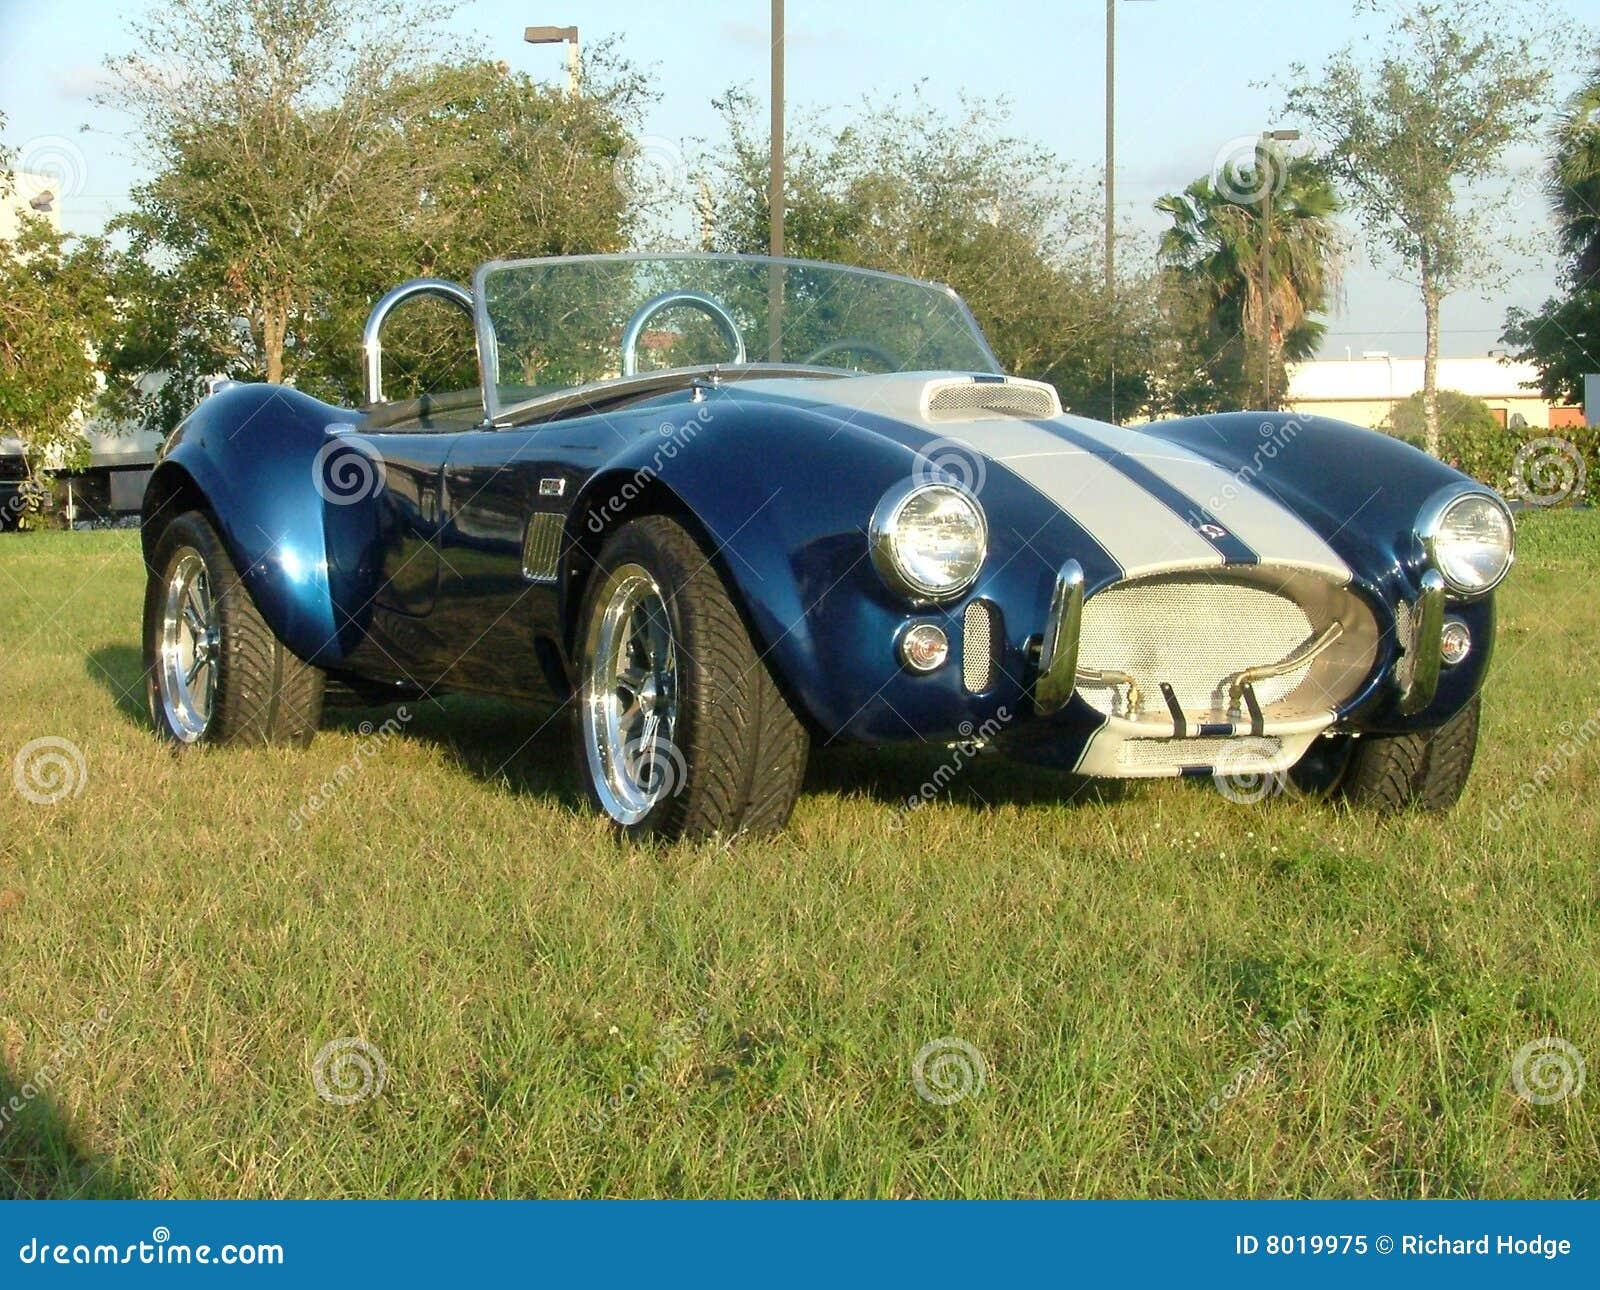 Classic cobra car white strips on blue vintage beauty